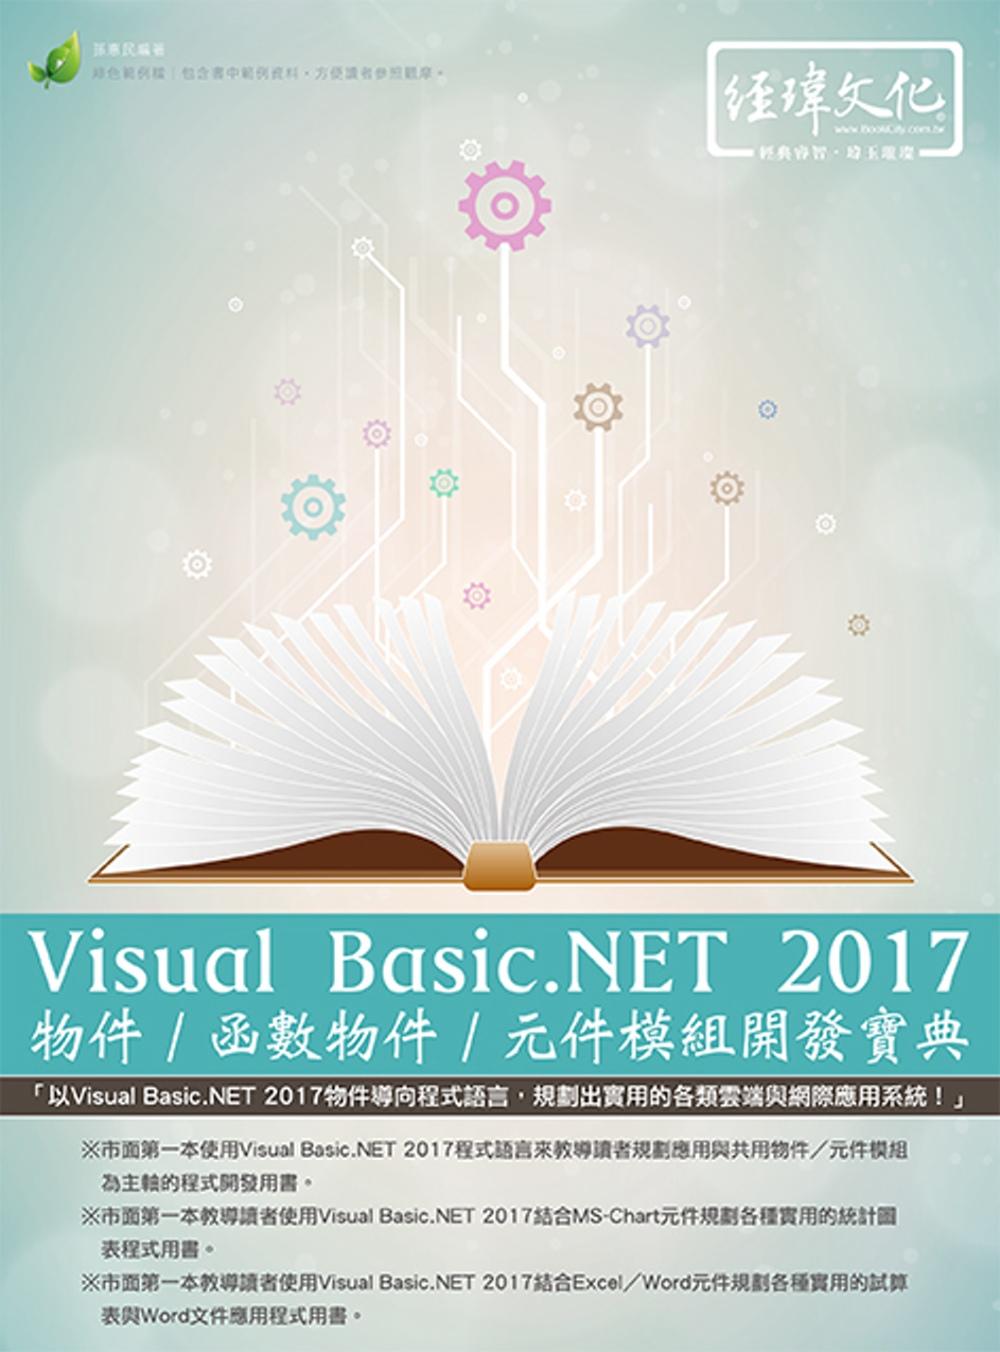 Visual Basic.NET 2017物件/函數物件/元件模組開發寶典(附綠色範例檔)